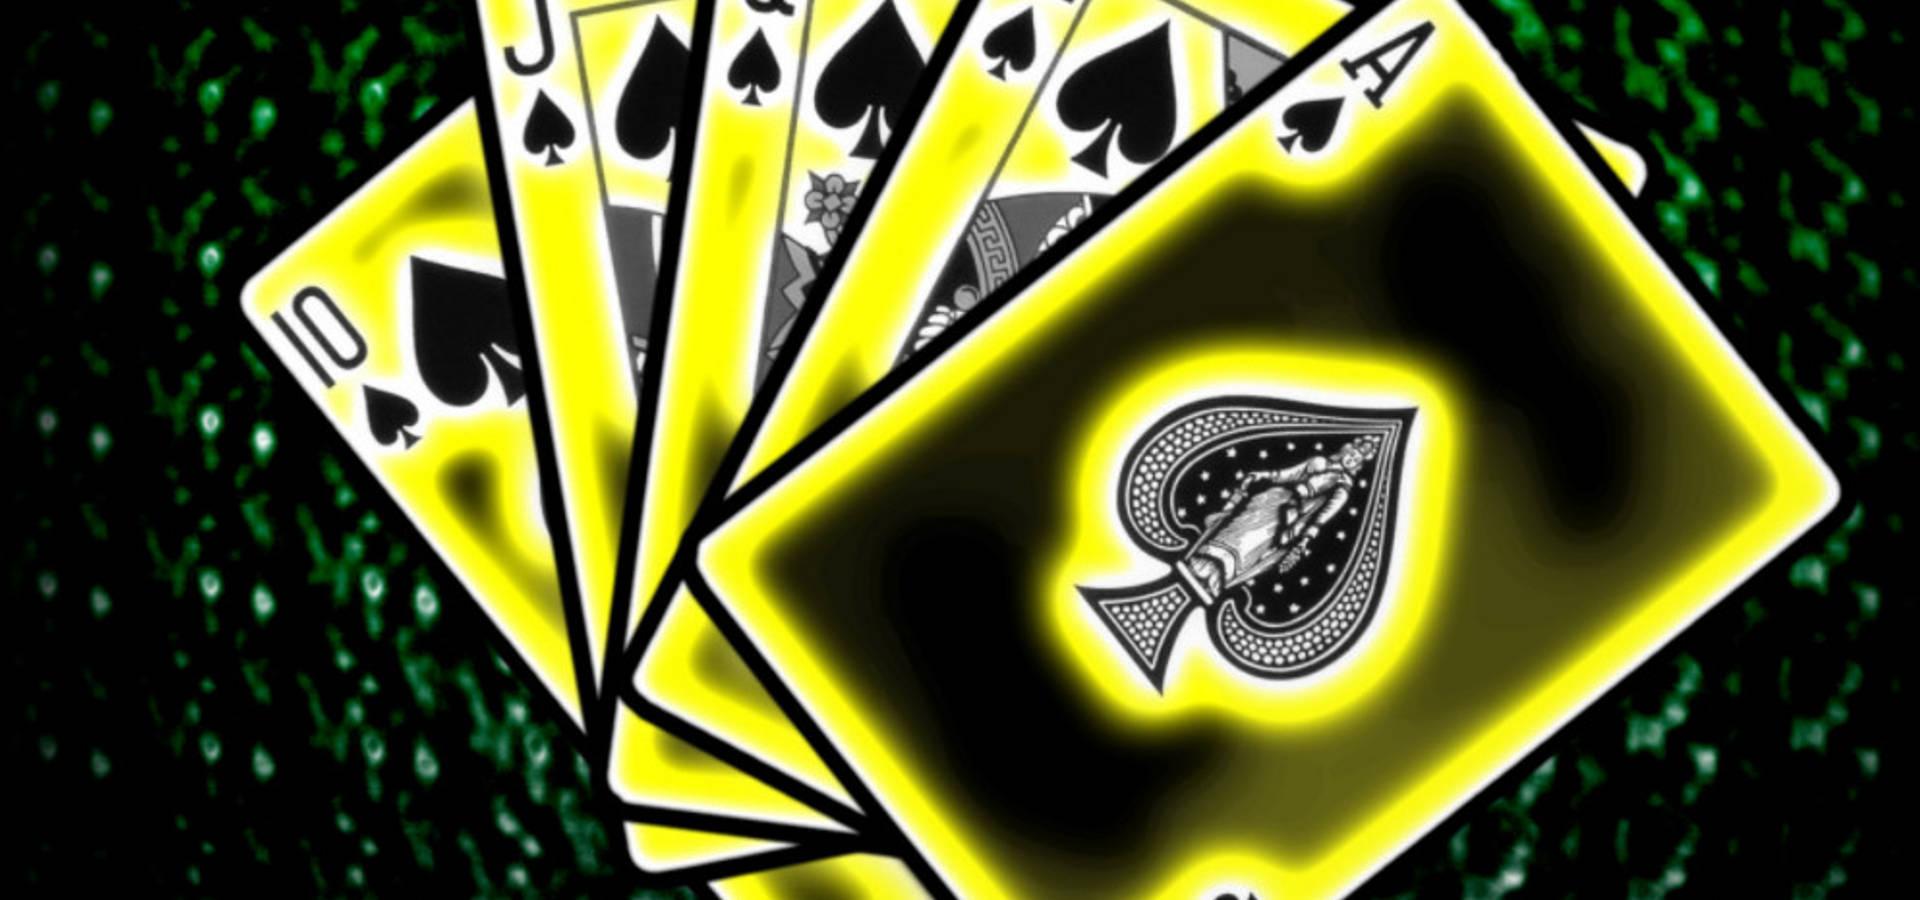 Indie104 : Daftar Situs Poker Online Pkv Games Judi QQ Terpercaya 2021